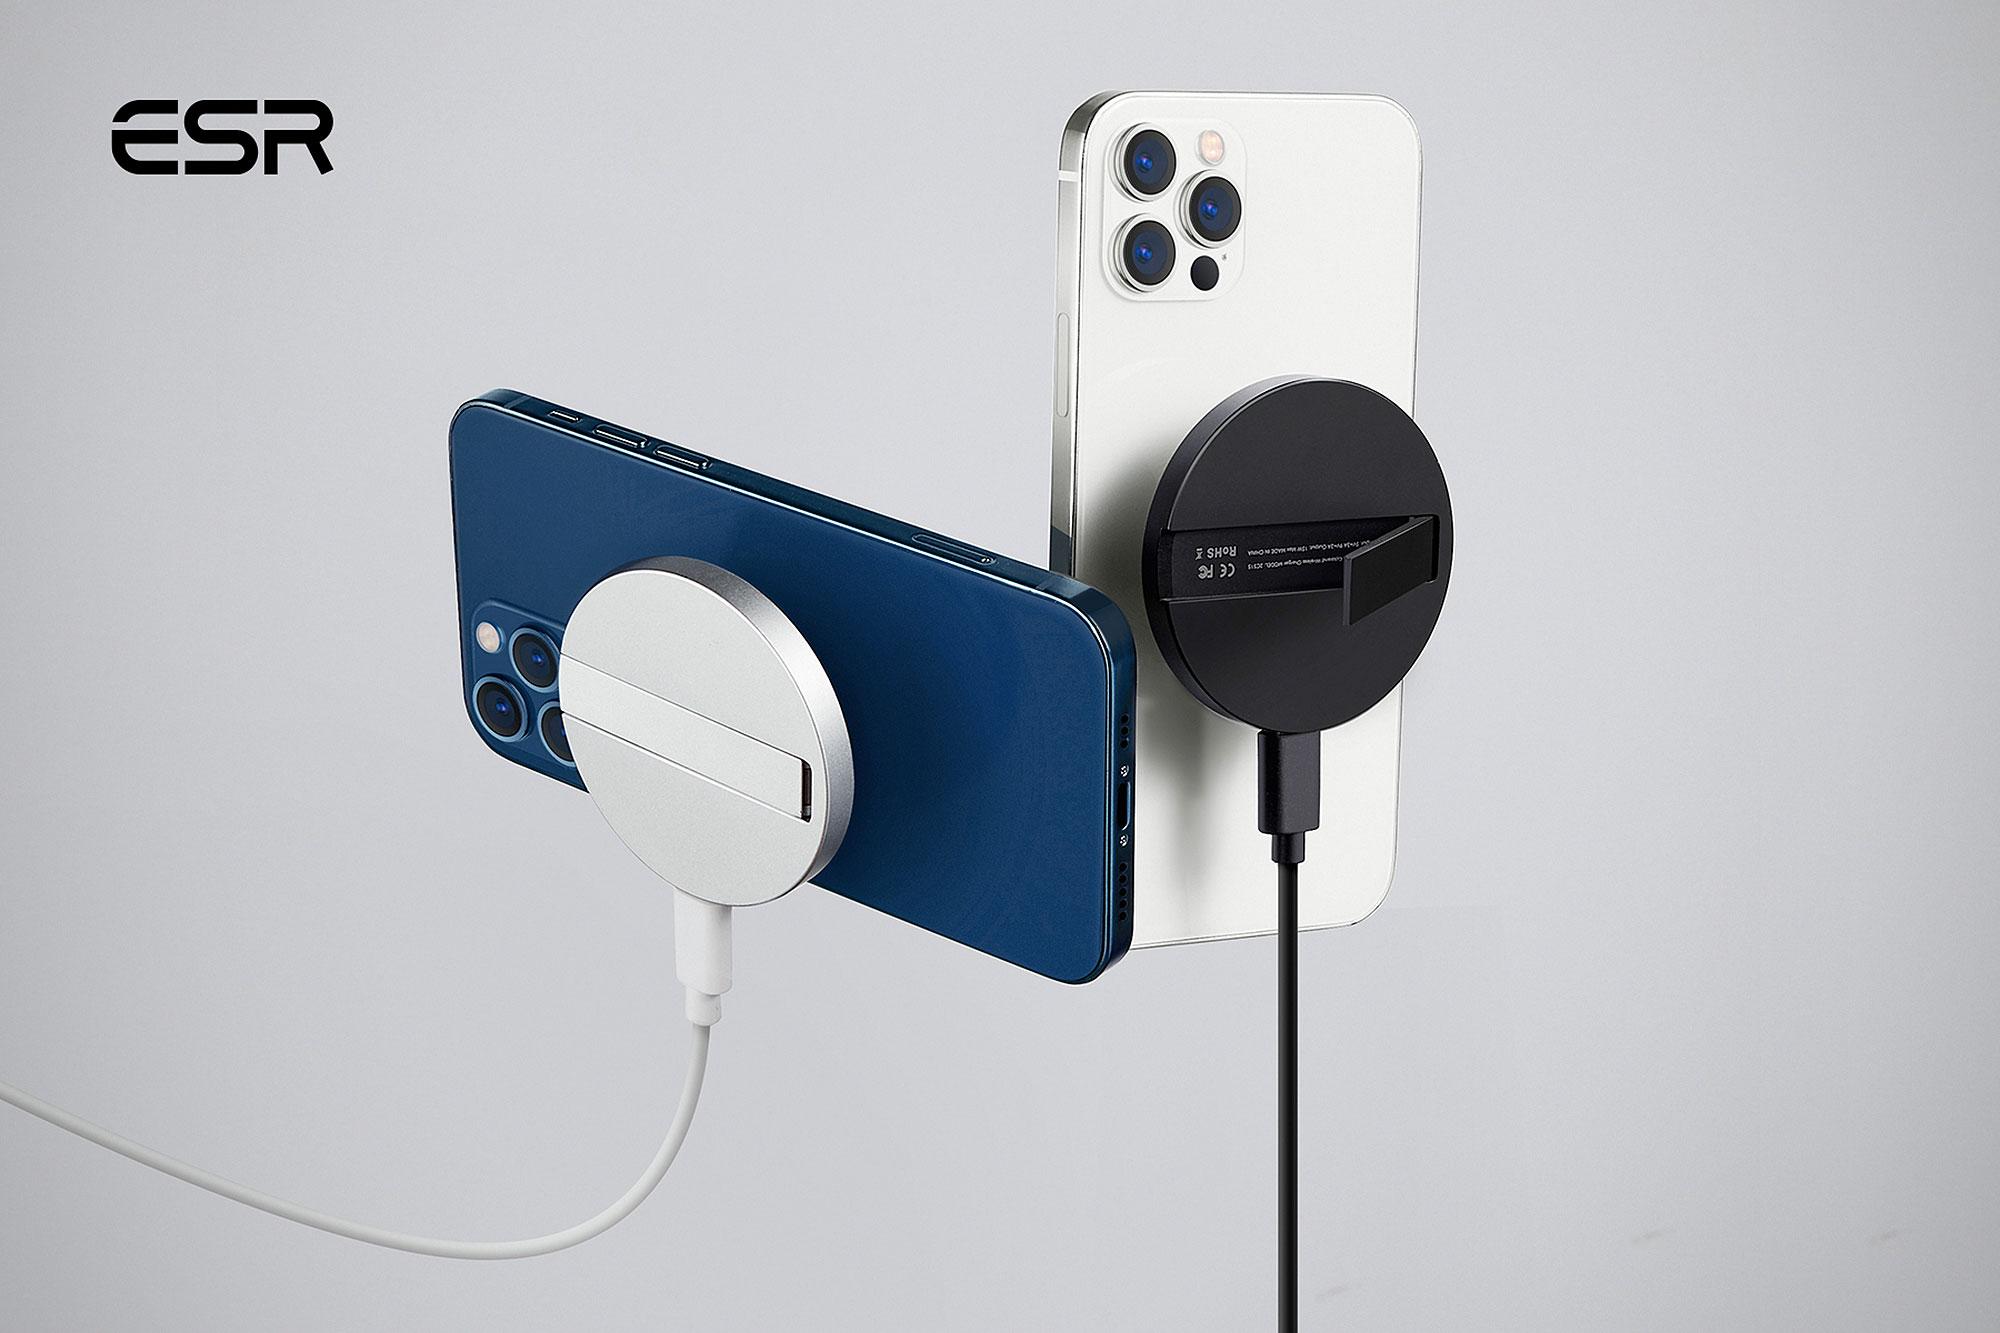 ESR HaloLock MagSafe-compatible Wireless Kickstand Charger